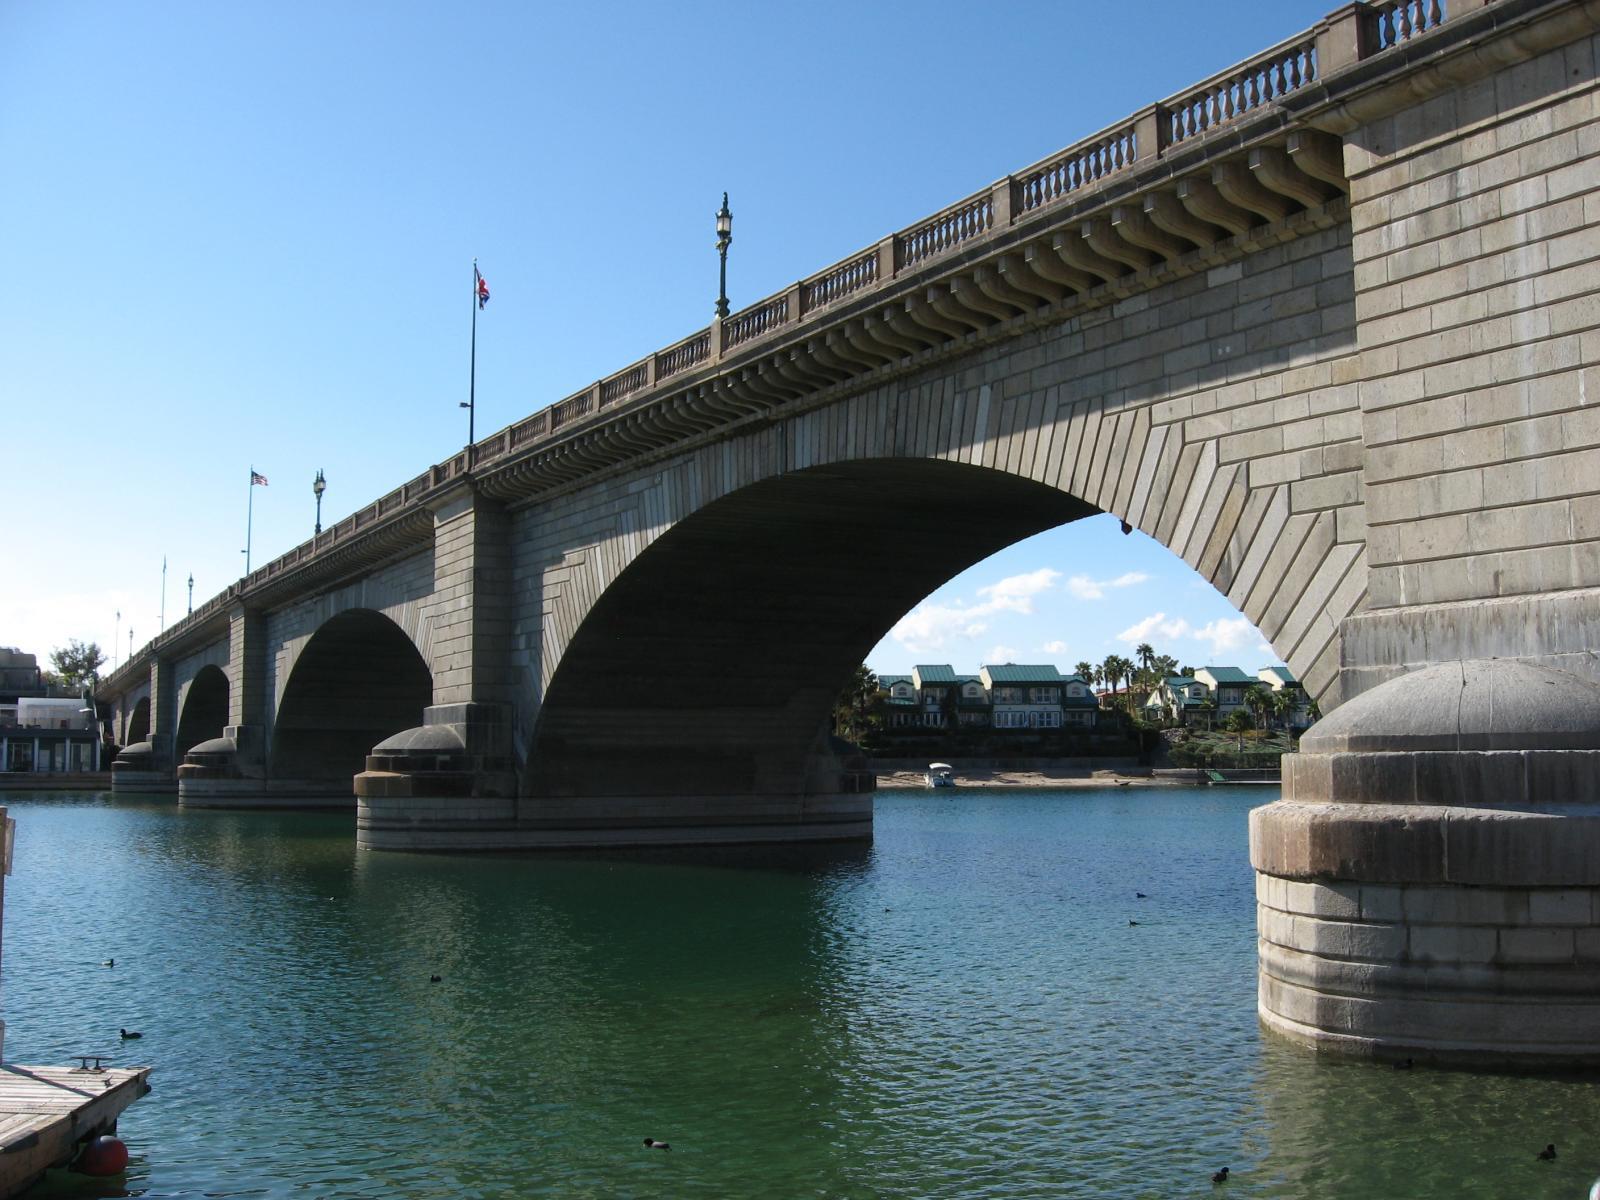 Arhitektura koja spaja ljude - Mostovi - Page 3 London_Bridge,_Lake_Havasu_City,_Arizona_(3227888290)